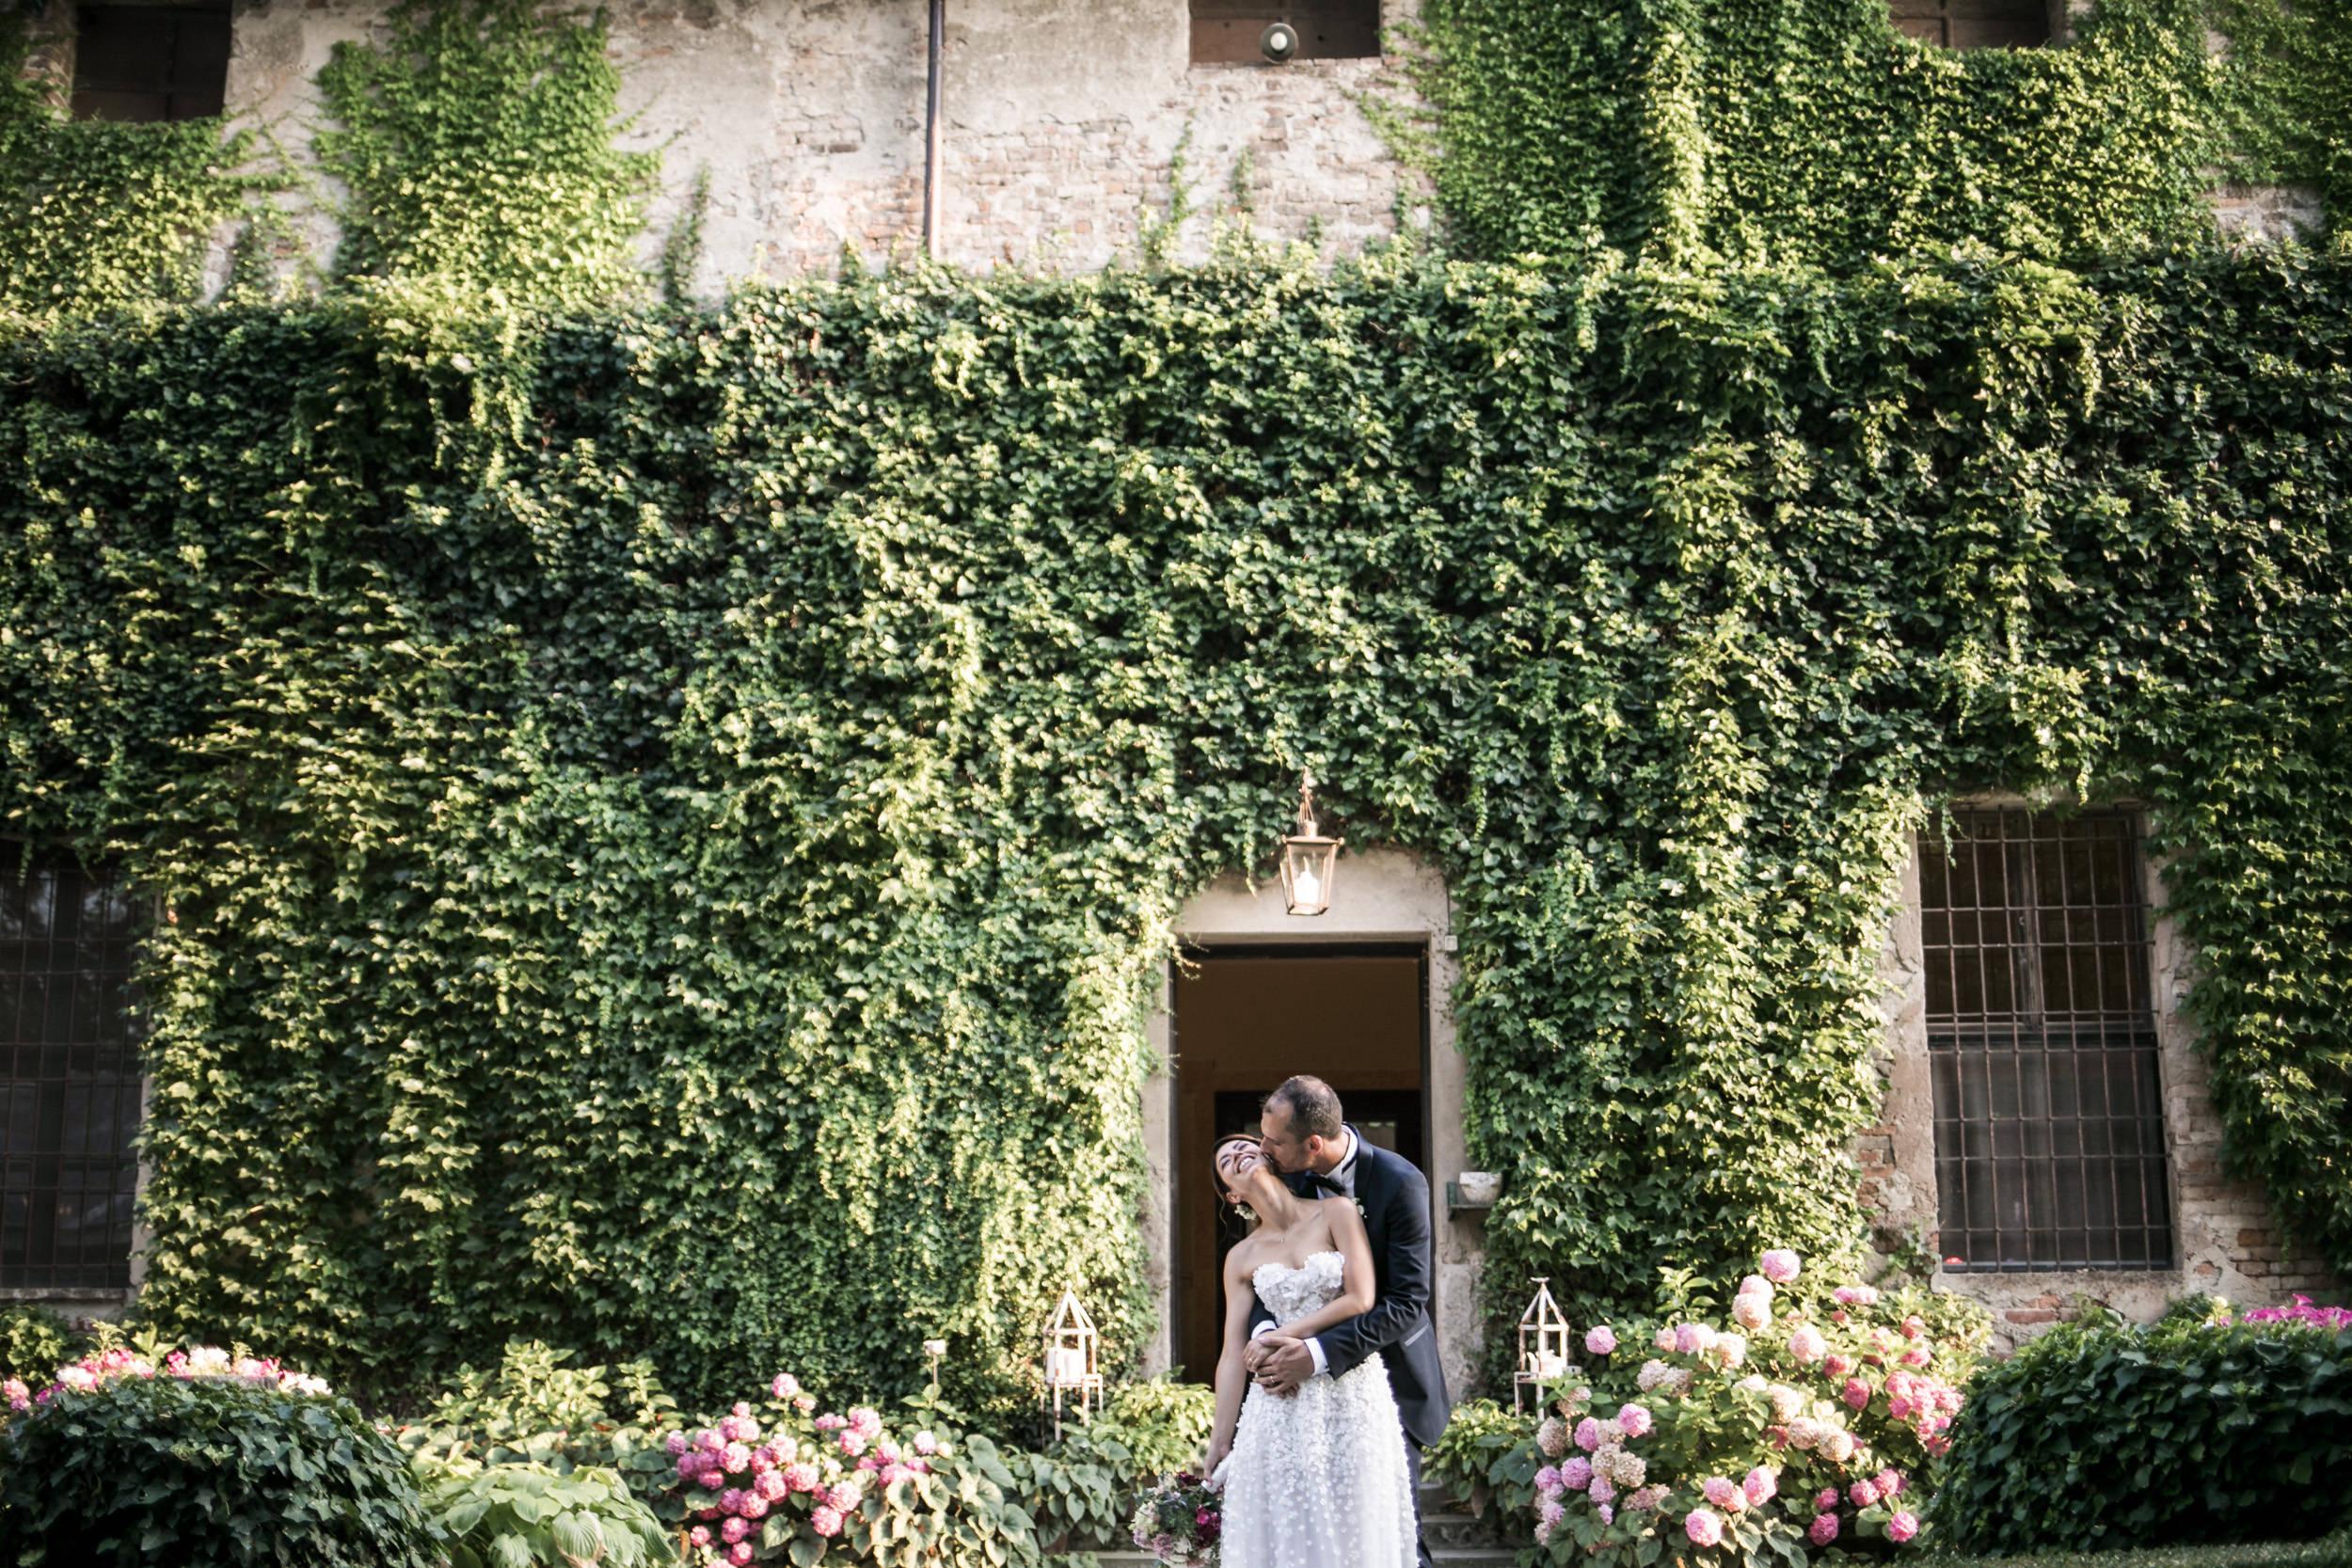 matrimonio_villa-ferrari-gussola_MI-085